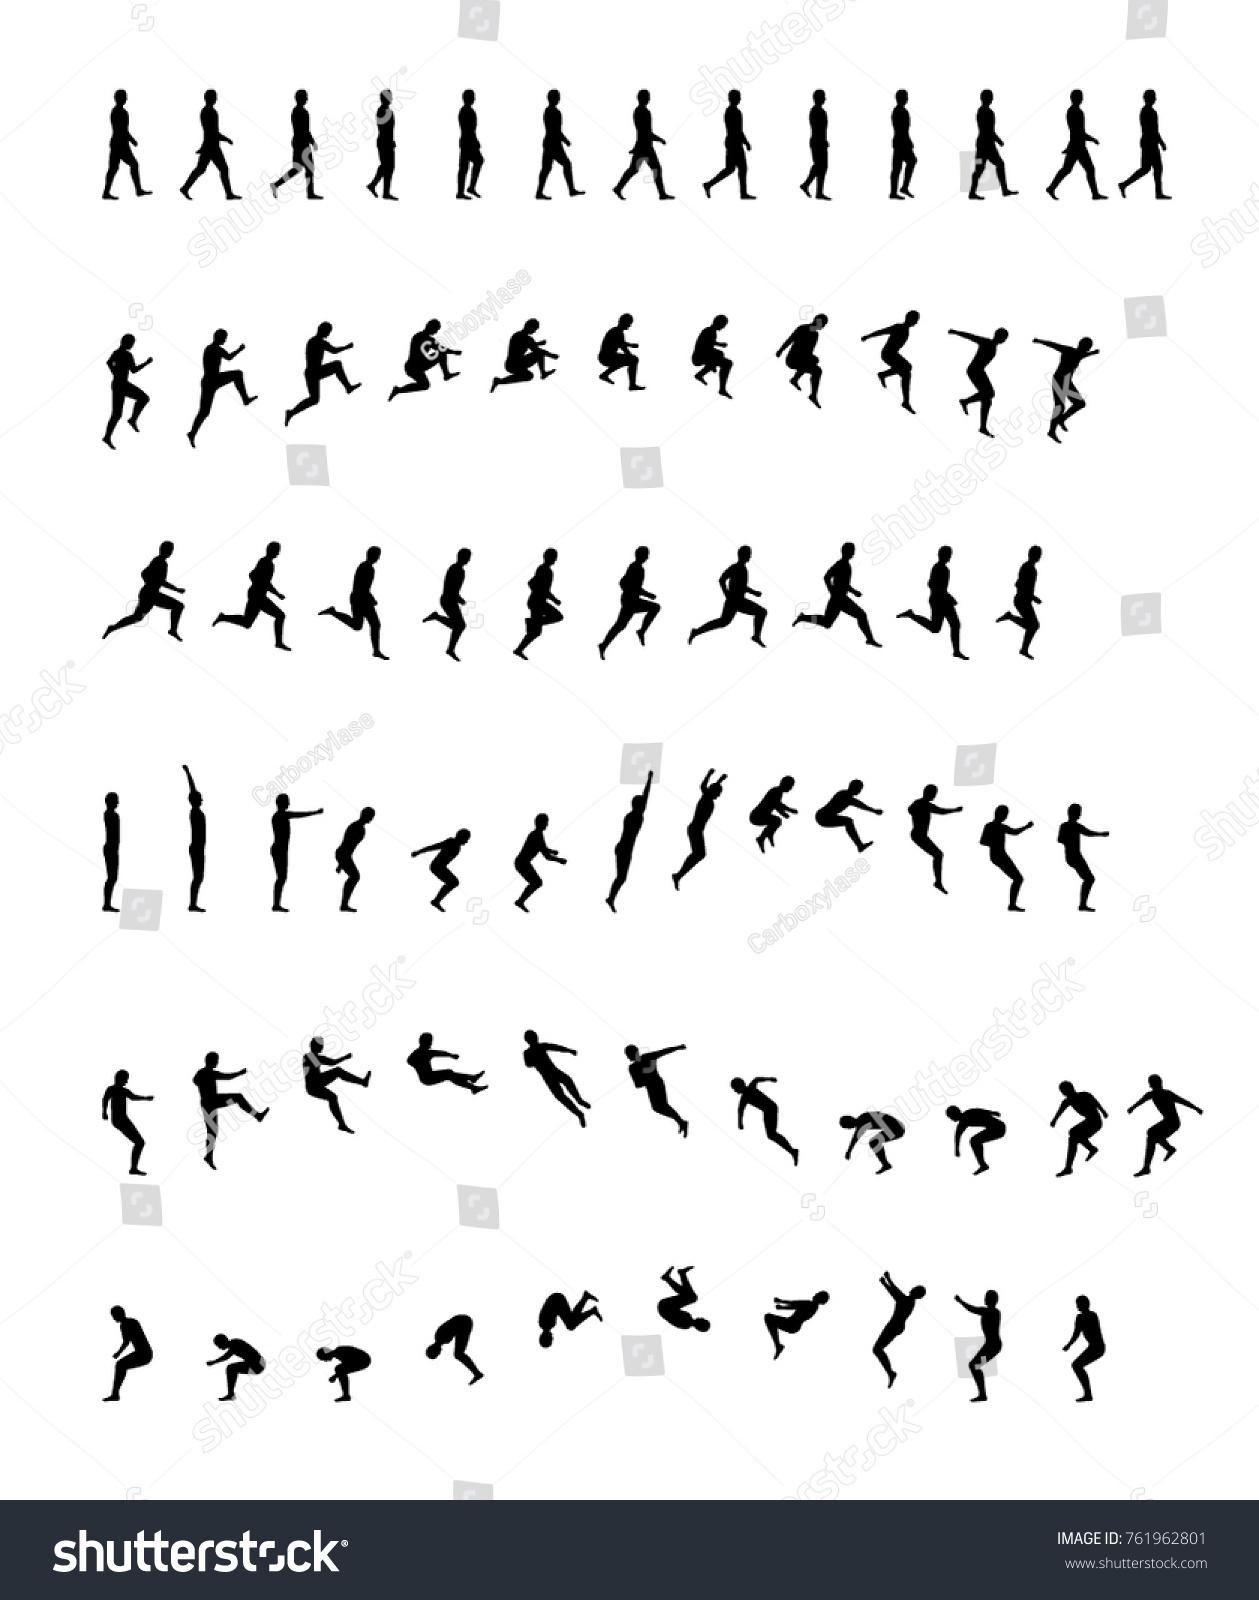 Walking Running Backflip Jogging Jumping Acrobatics Stock Vector ...